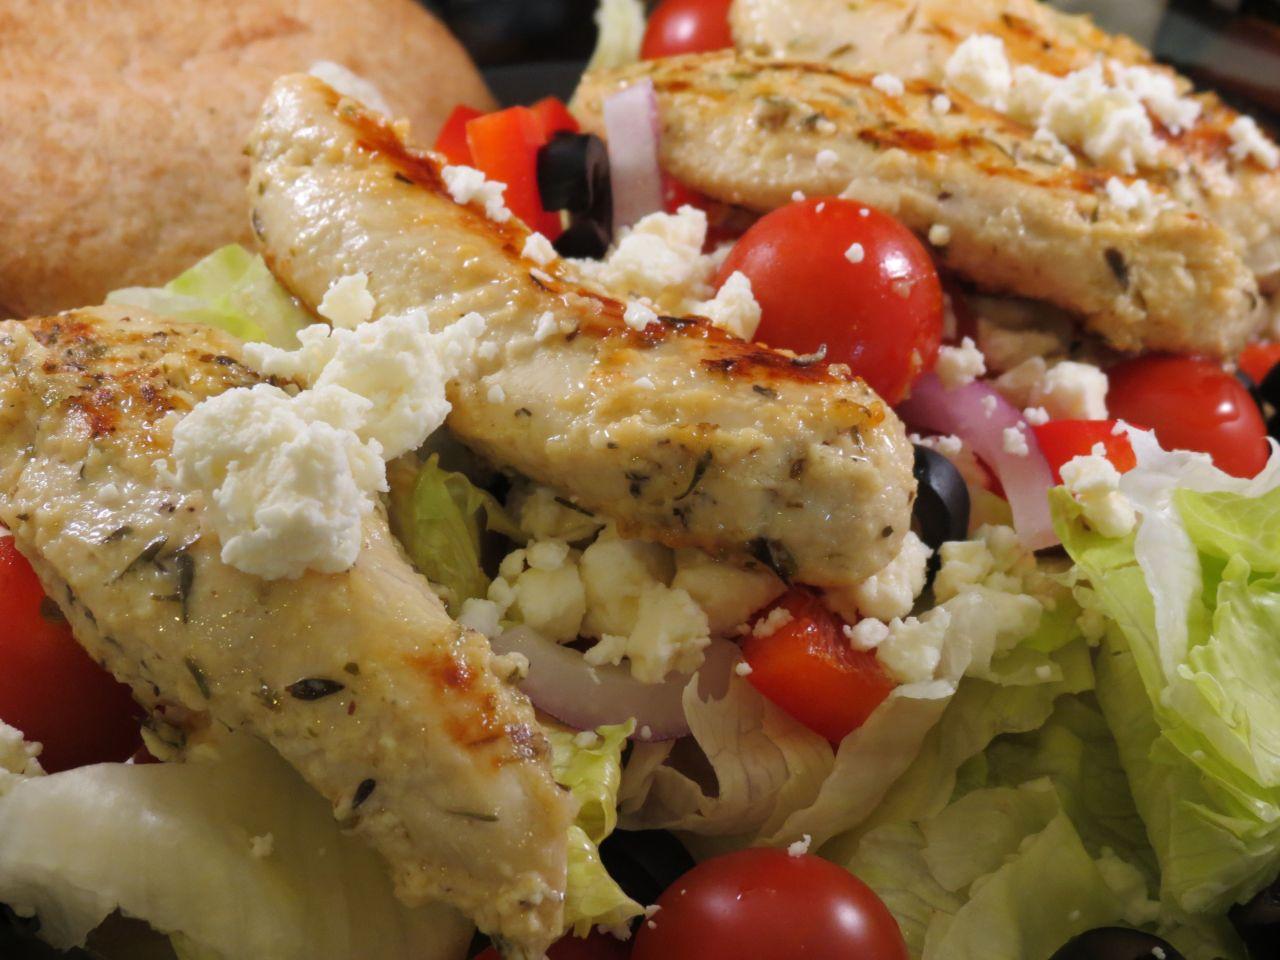 Greek Chicken Salad close up picture